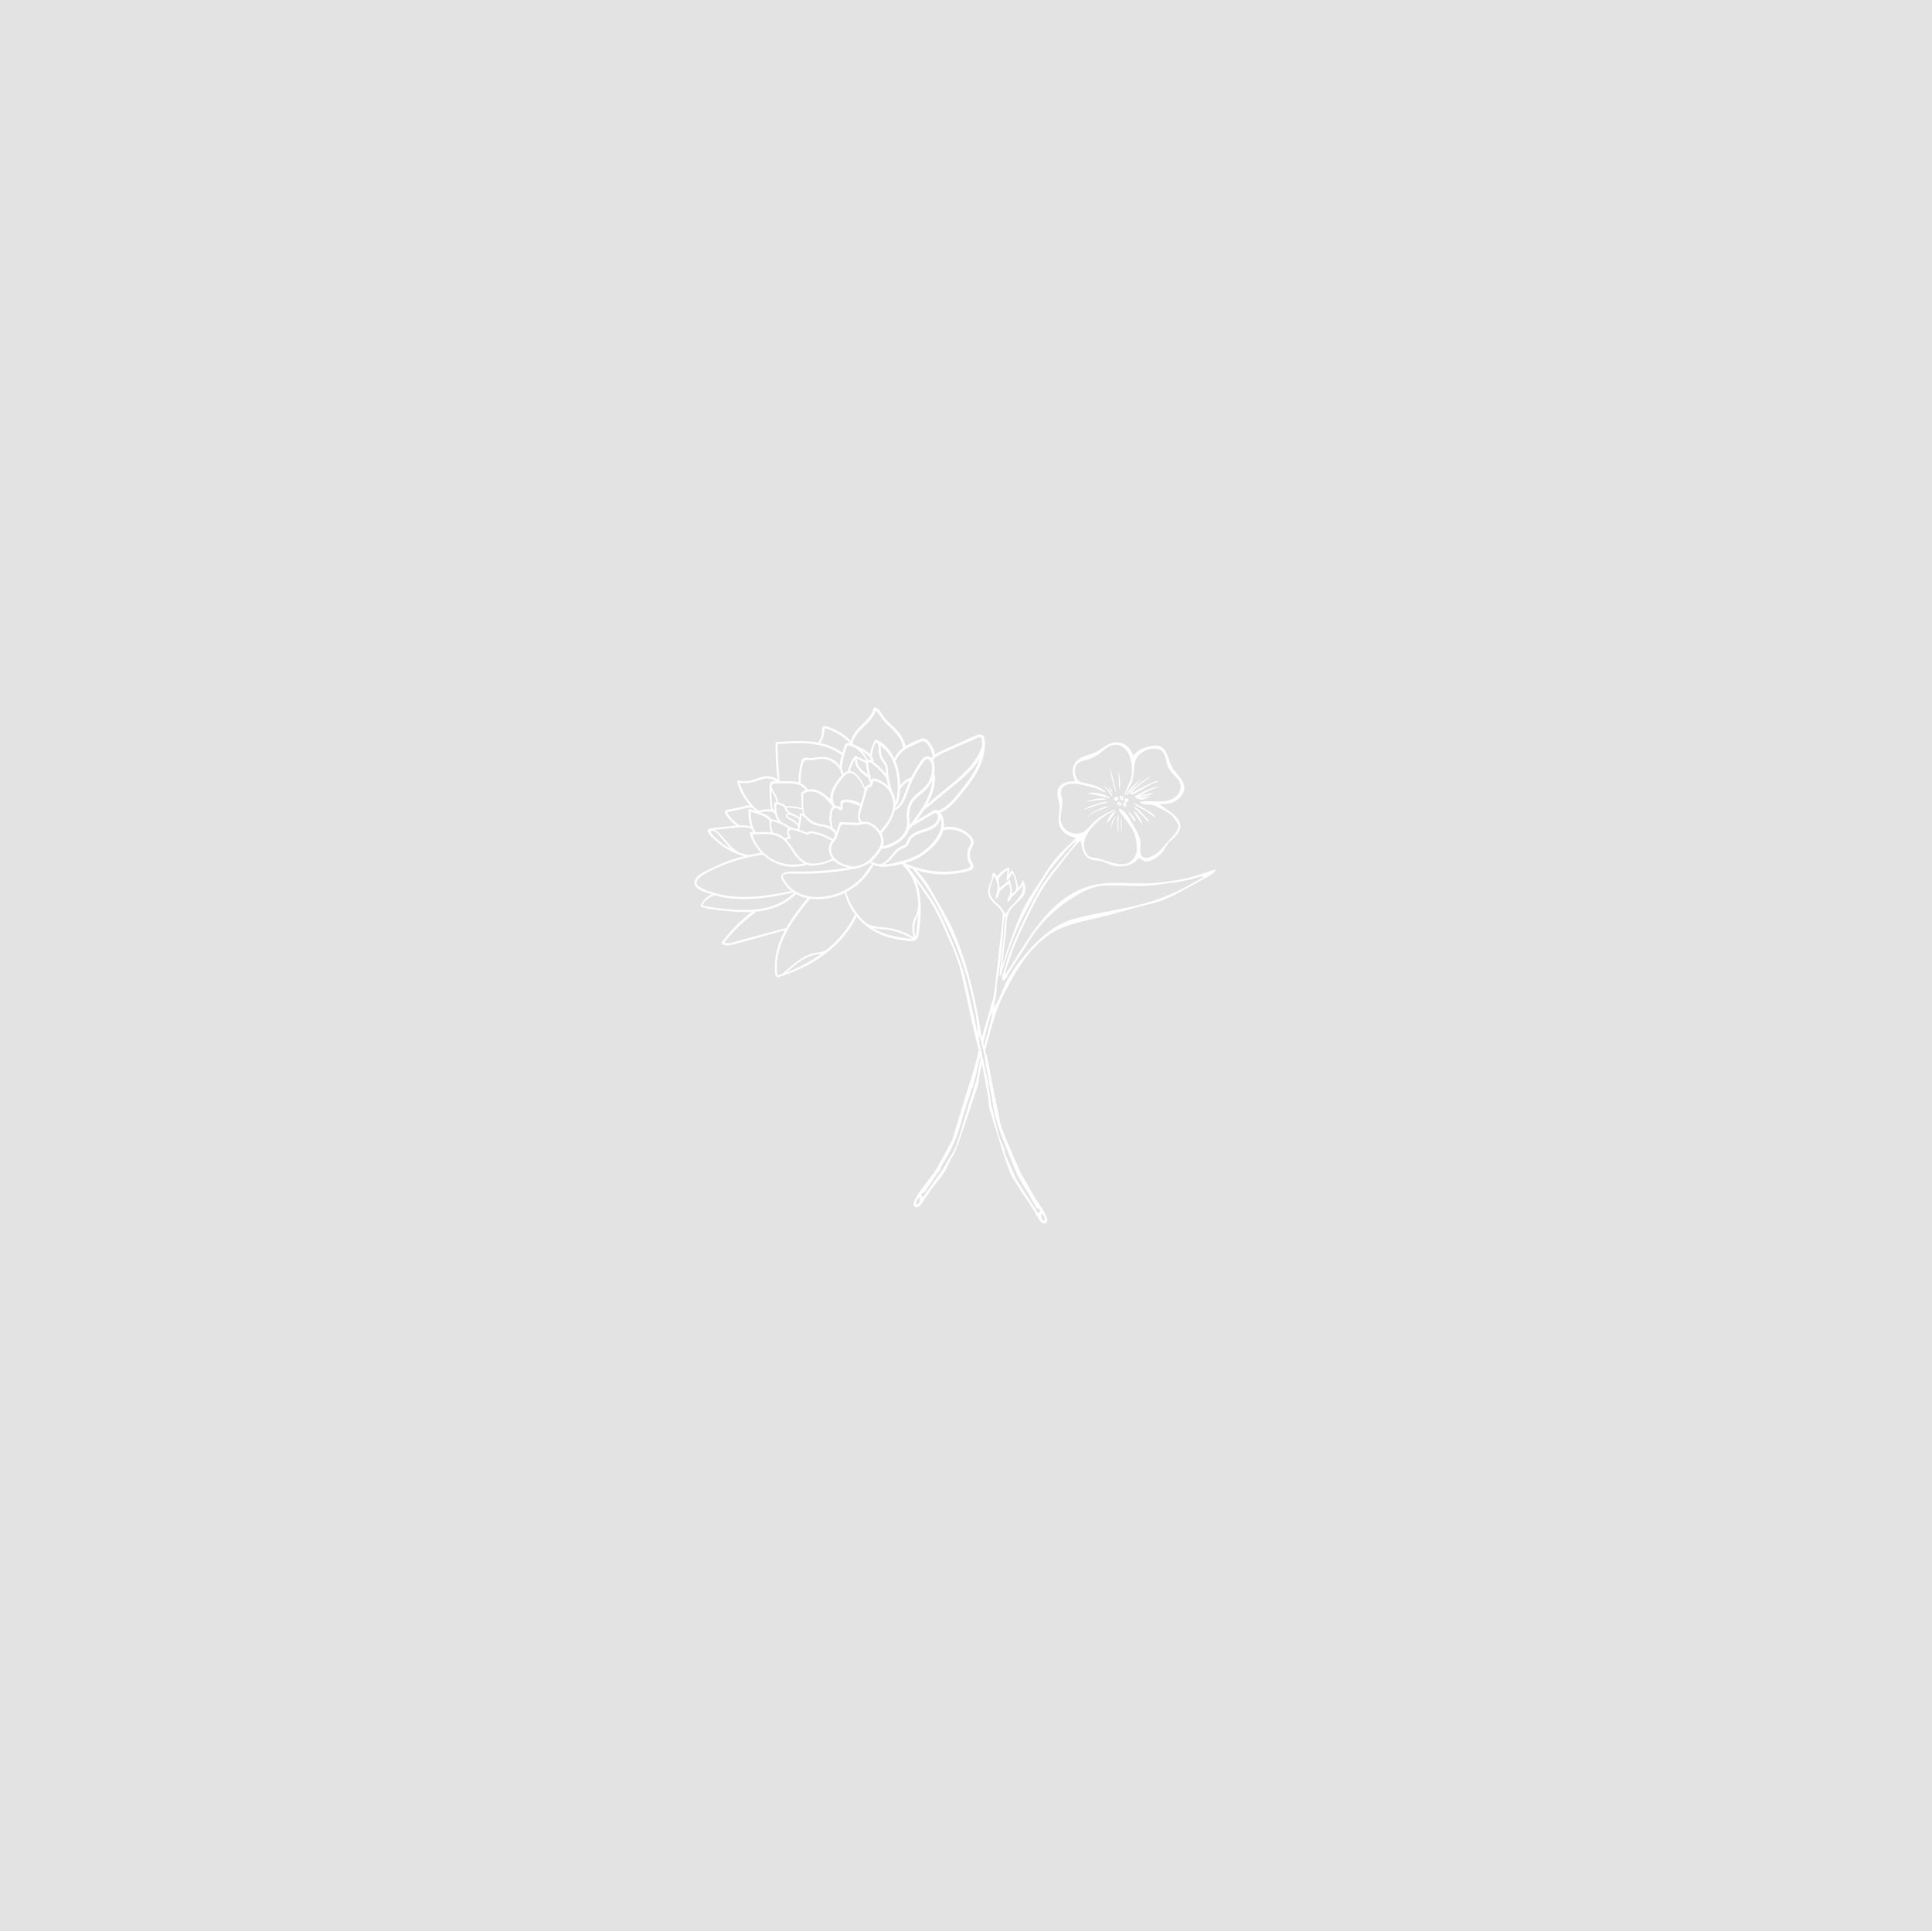 KXF_Social-07.jpg